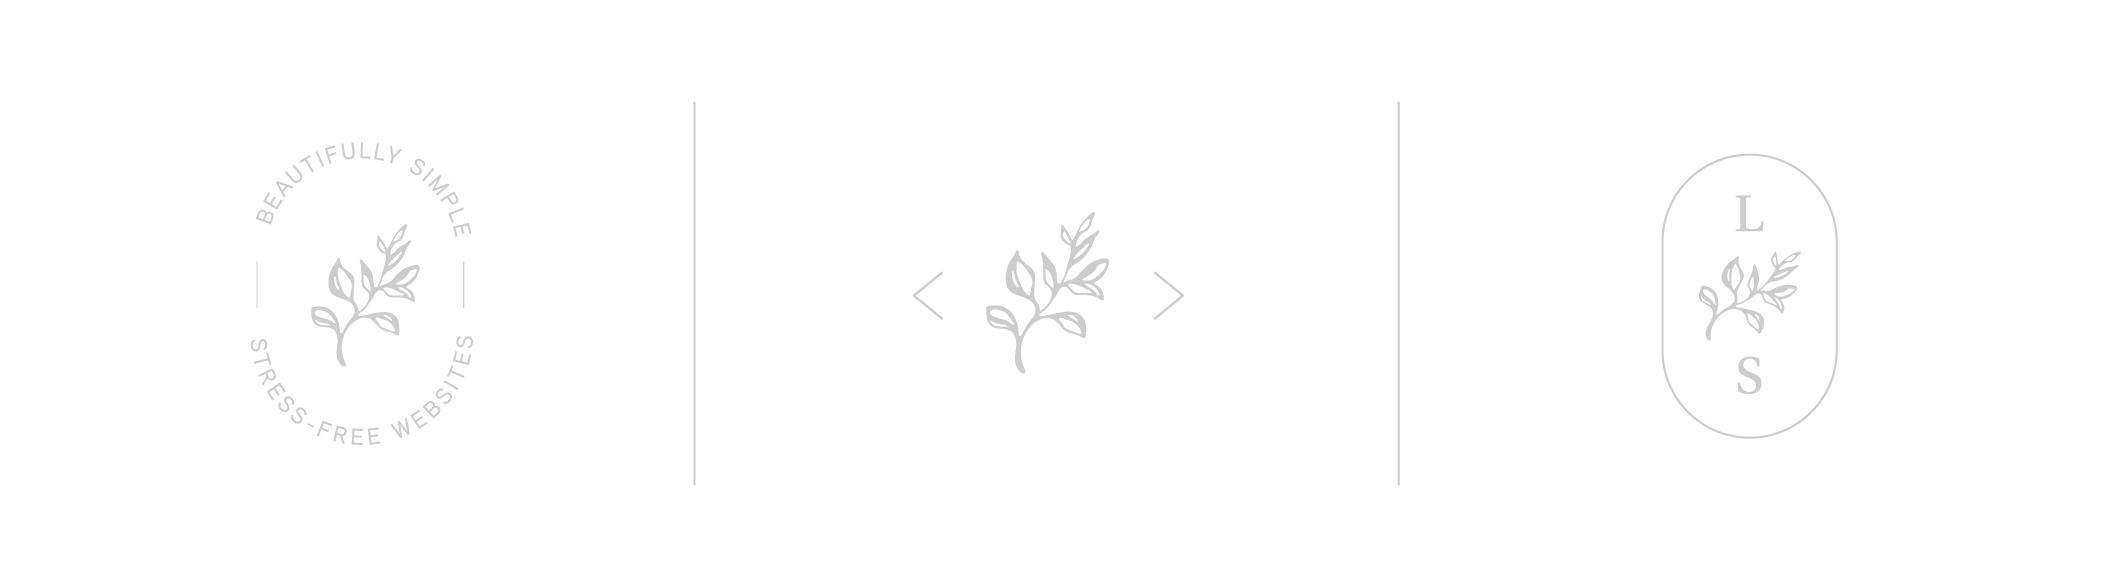 LS_Logo-Presentation-02.jpg